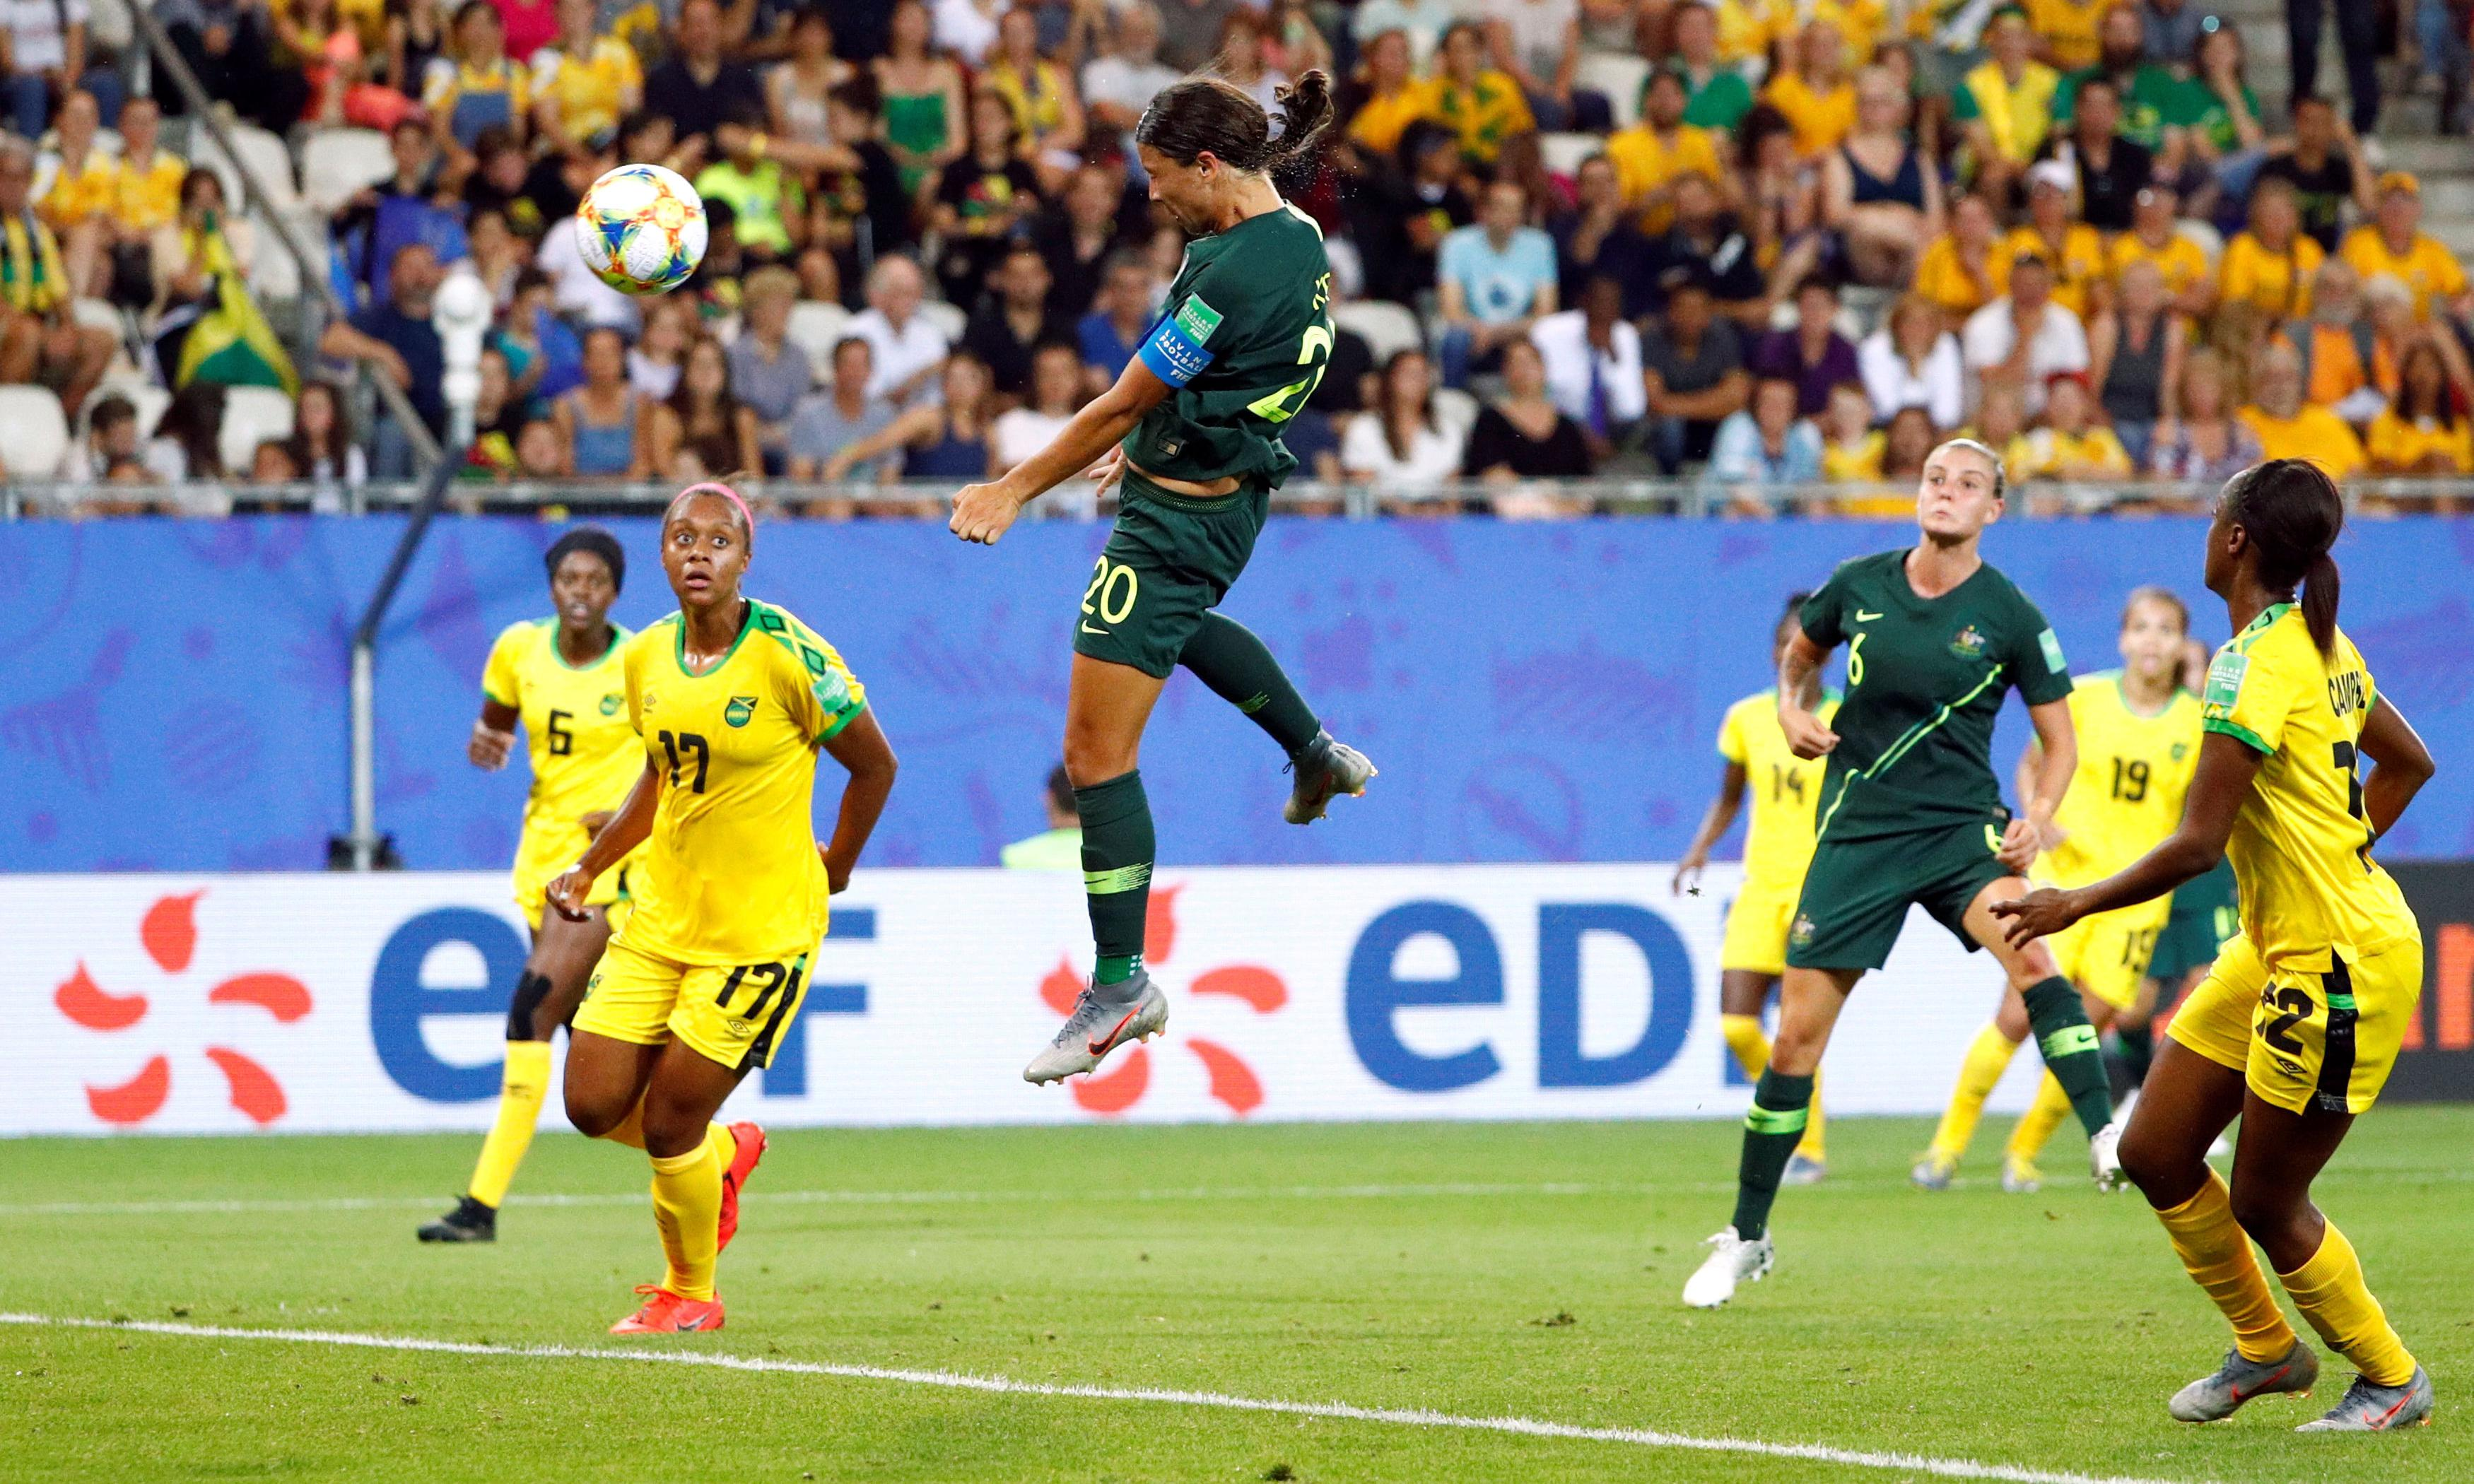 Sam Kerr nets four as Australia qualify for Women's World Cup last 16